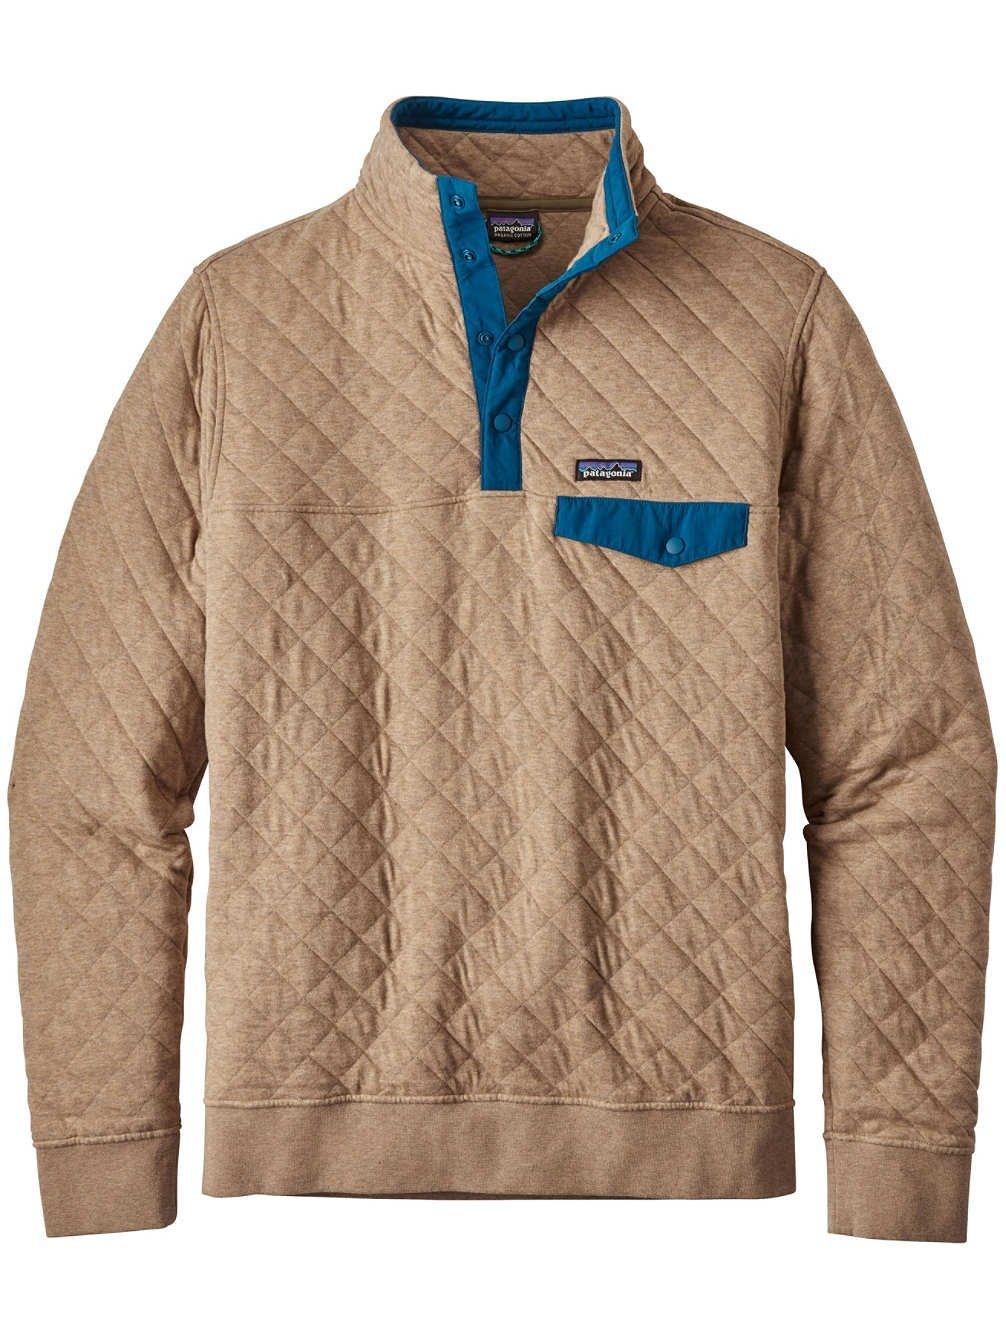 patagonia(パタゴニア) メンズコットンキルトスナップTプルオーバー Ms Cotton Quilt Snap-T P/O 25371 B073RNQCBG X-Large|Mojave Khaki Mojave Khaki X-Large